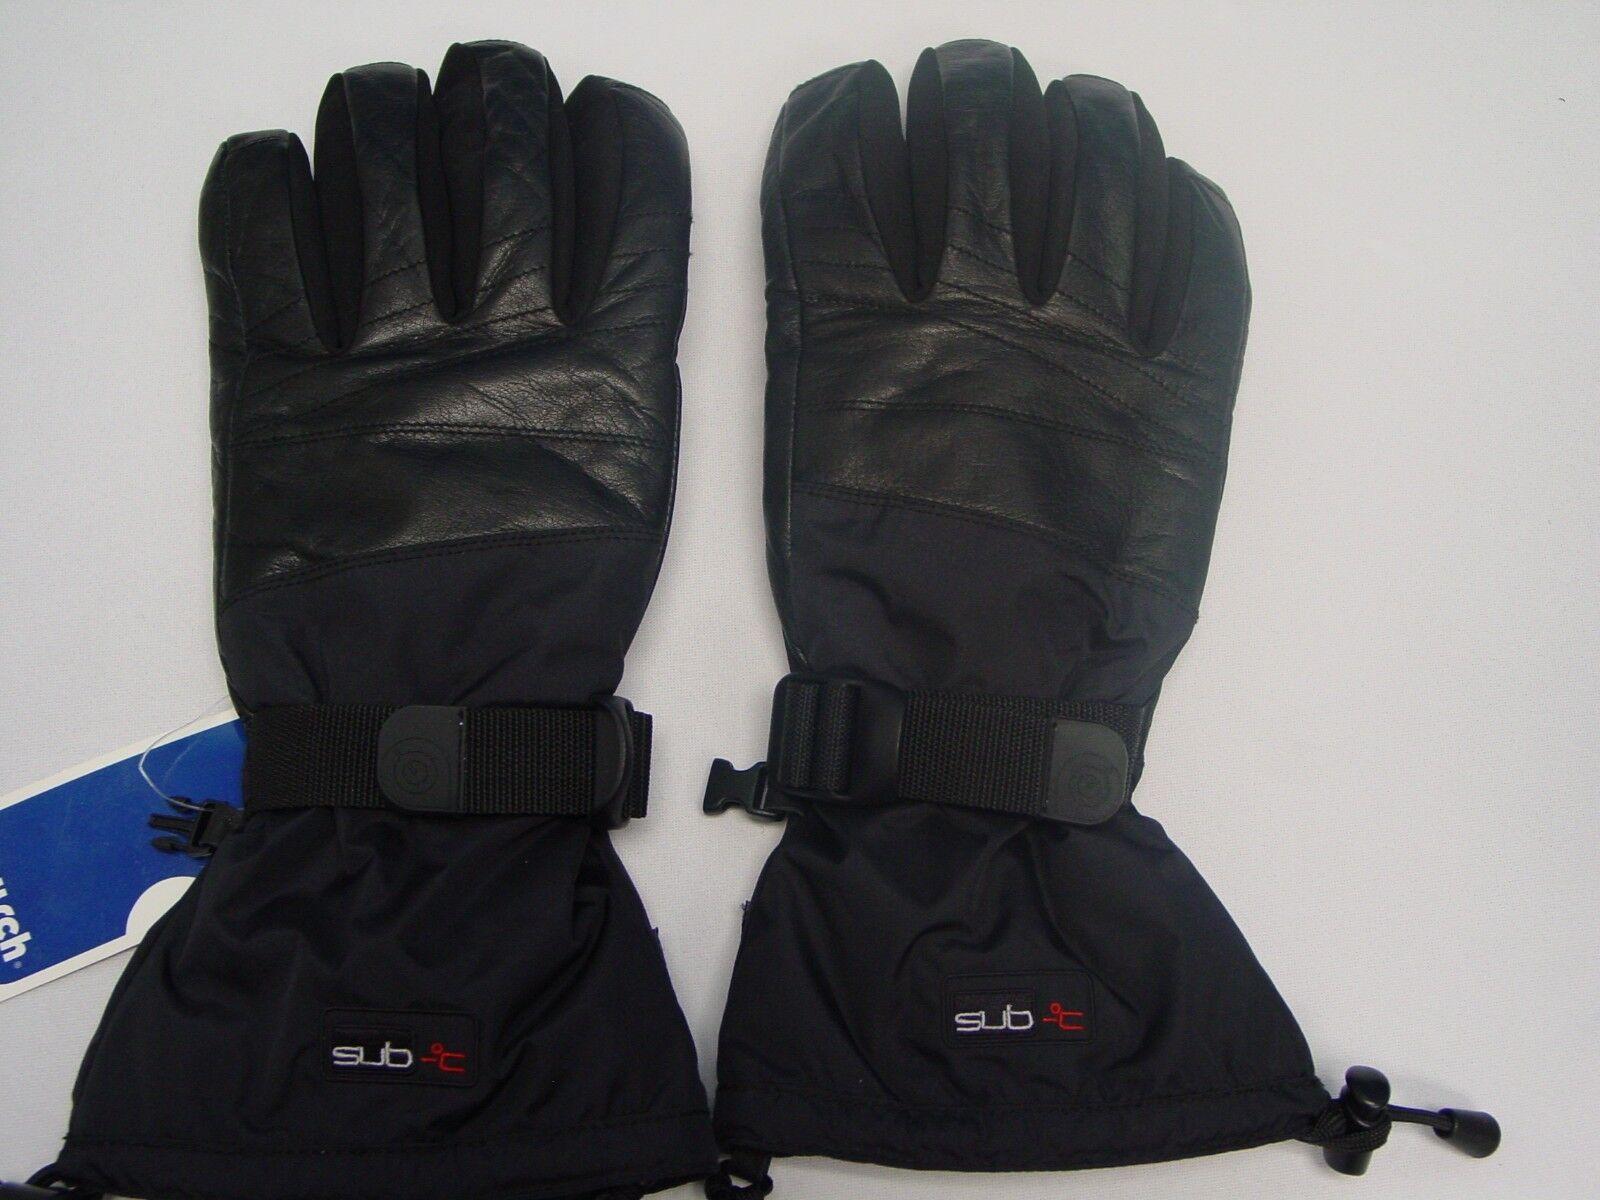 Neu Reusch Ski Snowboard Handschuhe Sub C Wärme Rtex 2490203 Größe Mittel Wayne